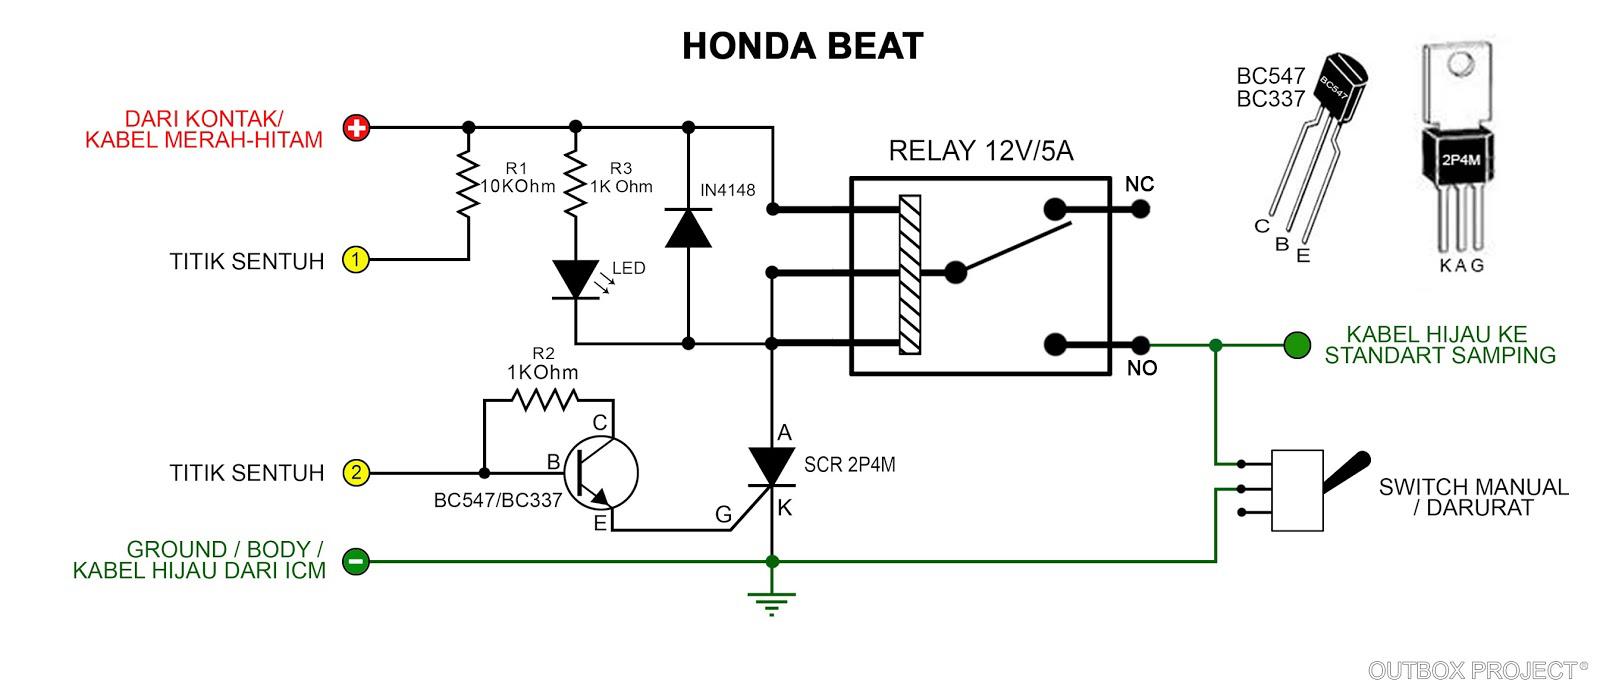 Wiring diagram cdi honda beat